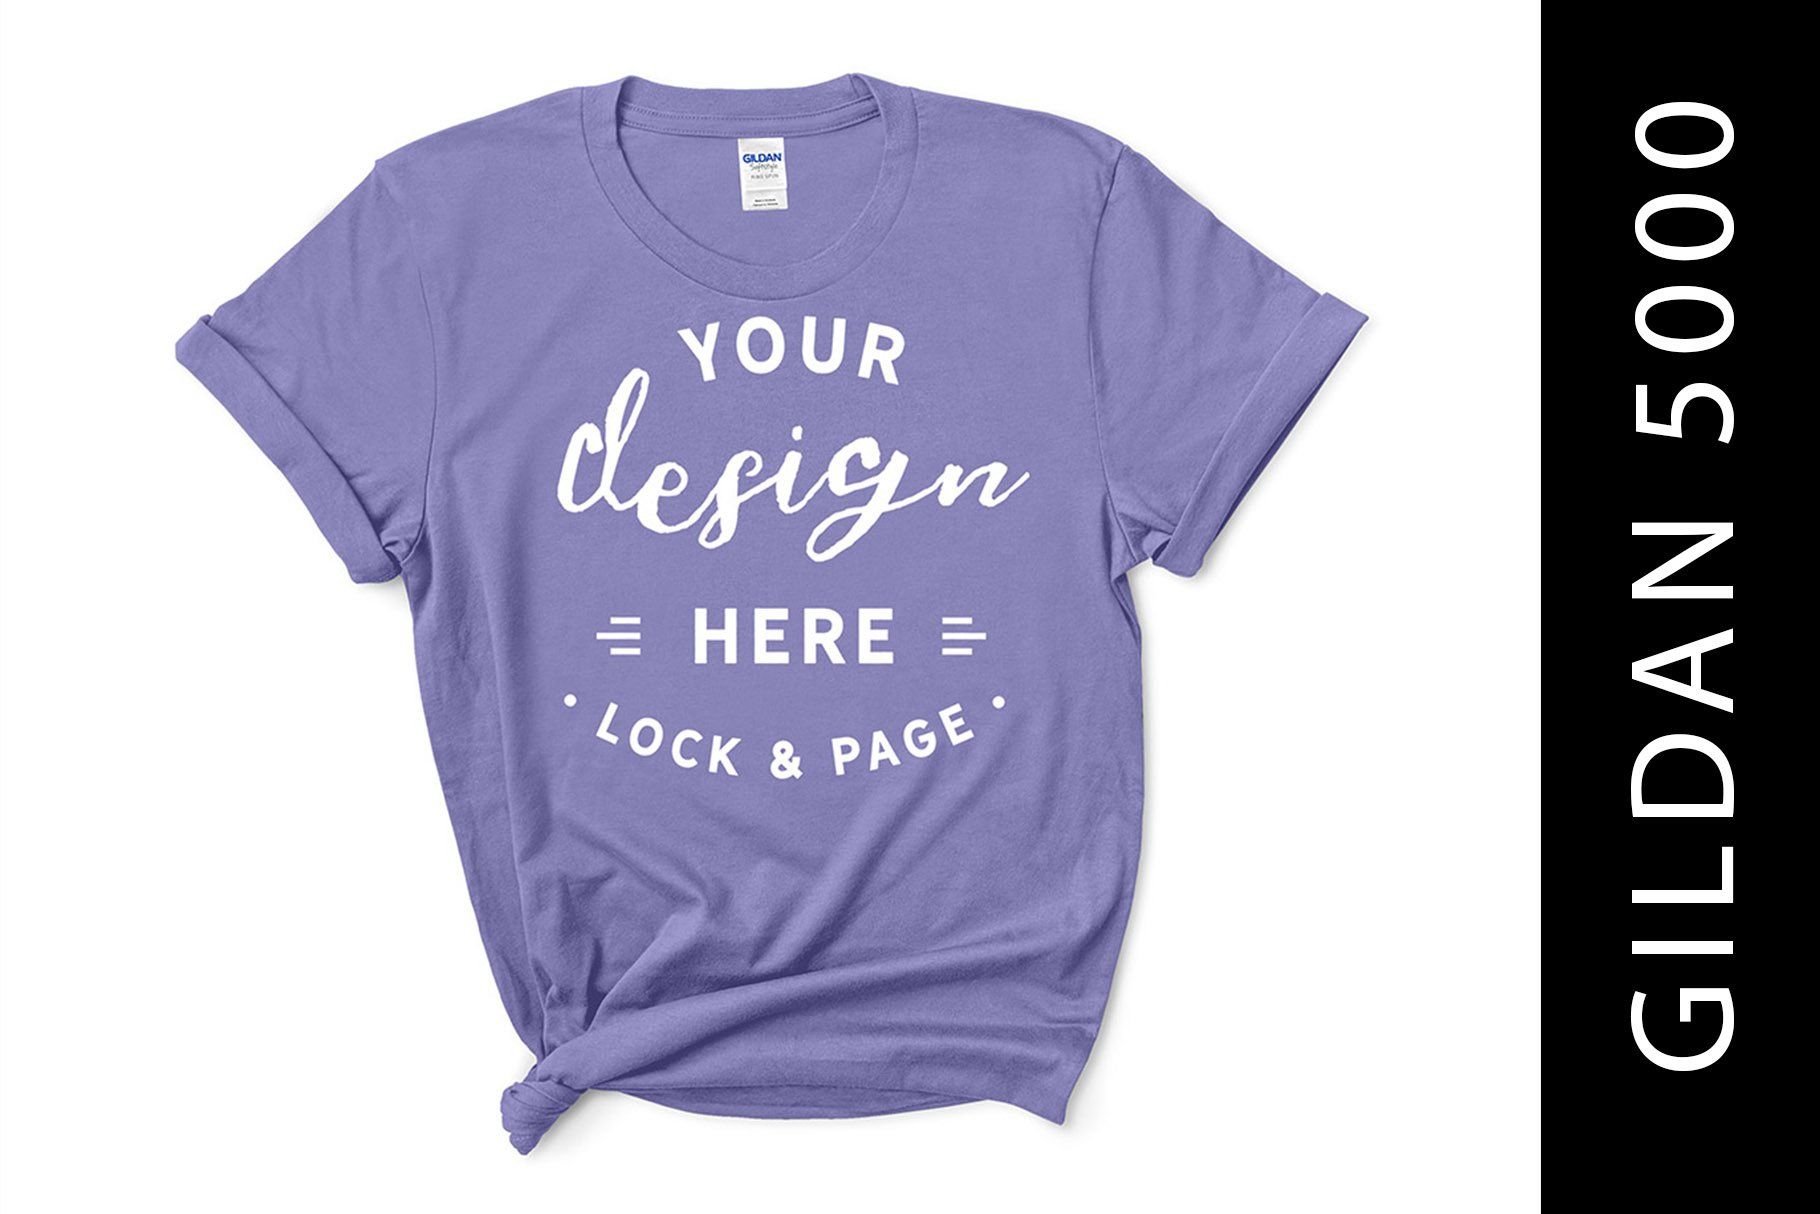 Download Female Gildan 5000 Mockup Bundle Shirt Mockup Tshirt Mockup Shirt Designs